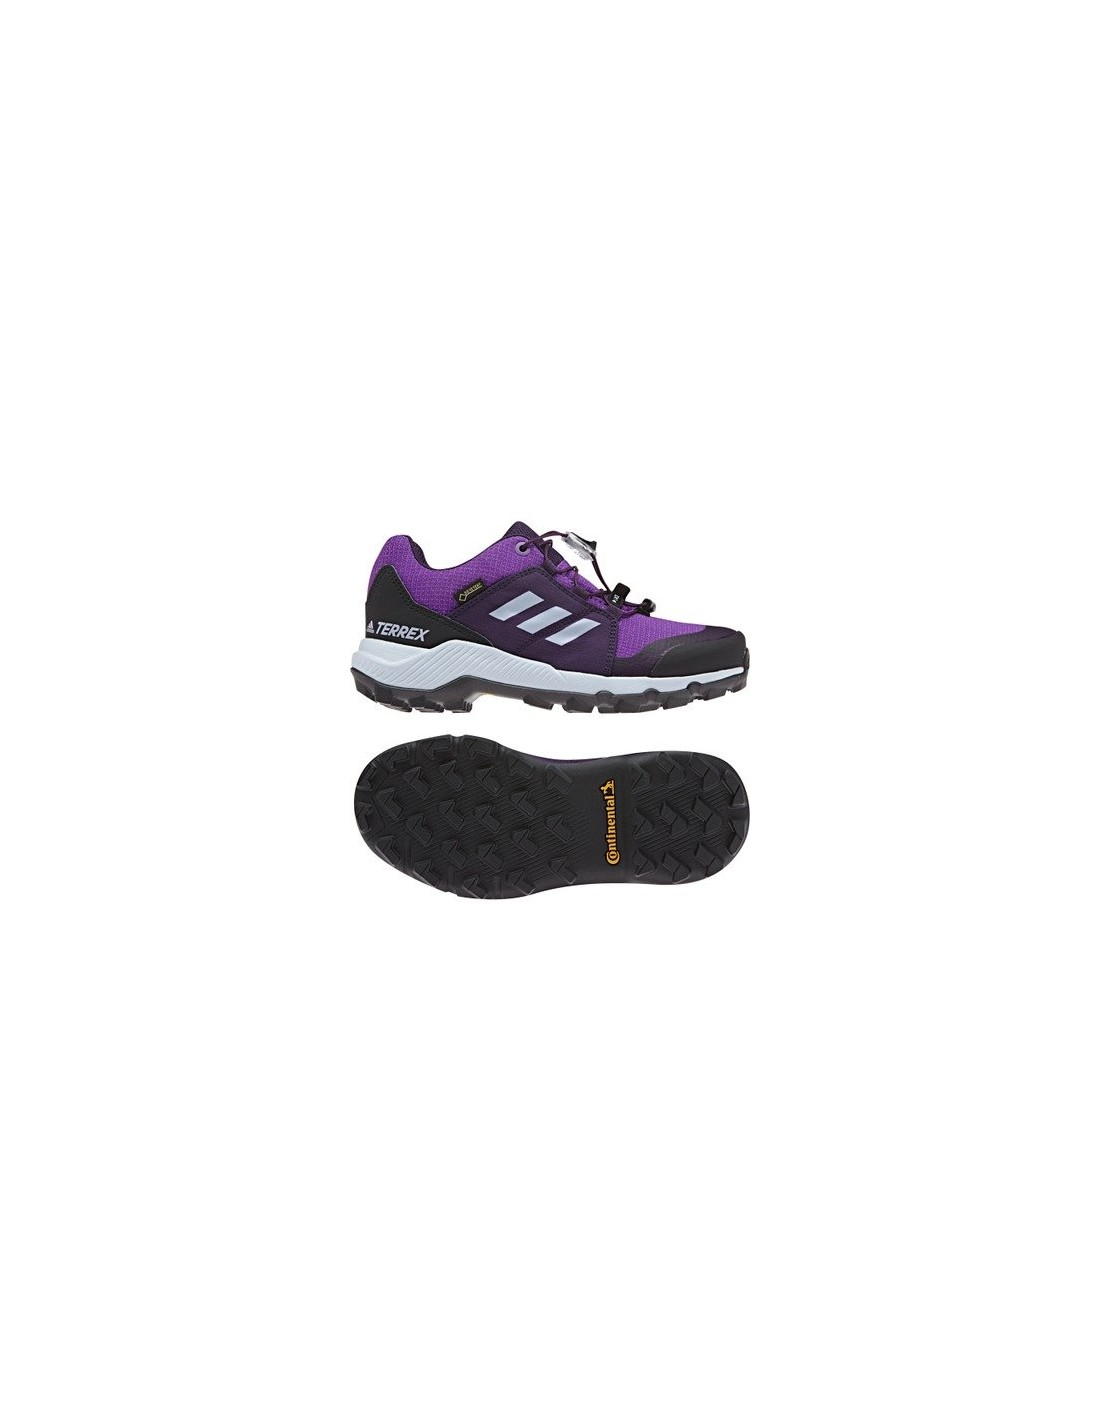 Hikingsko Barn&Junior Adidas Terrex GTX Kids Purple BC0600 999 kr